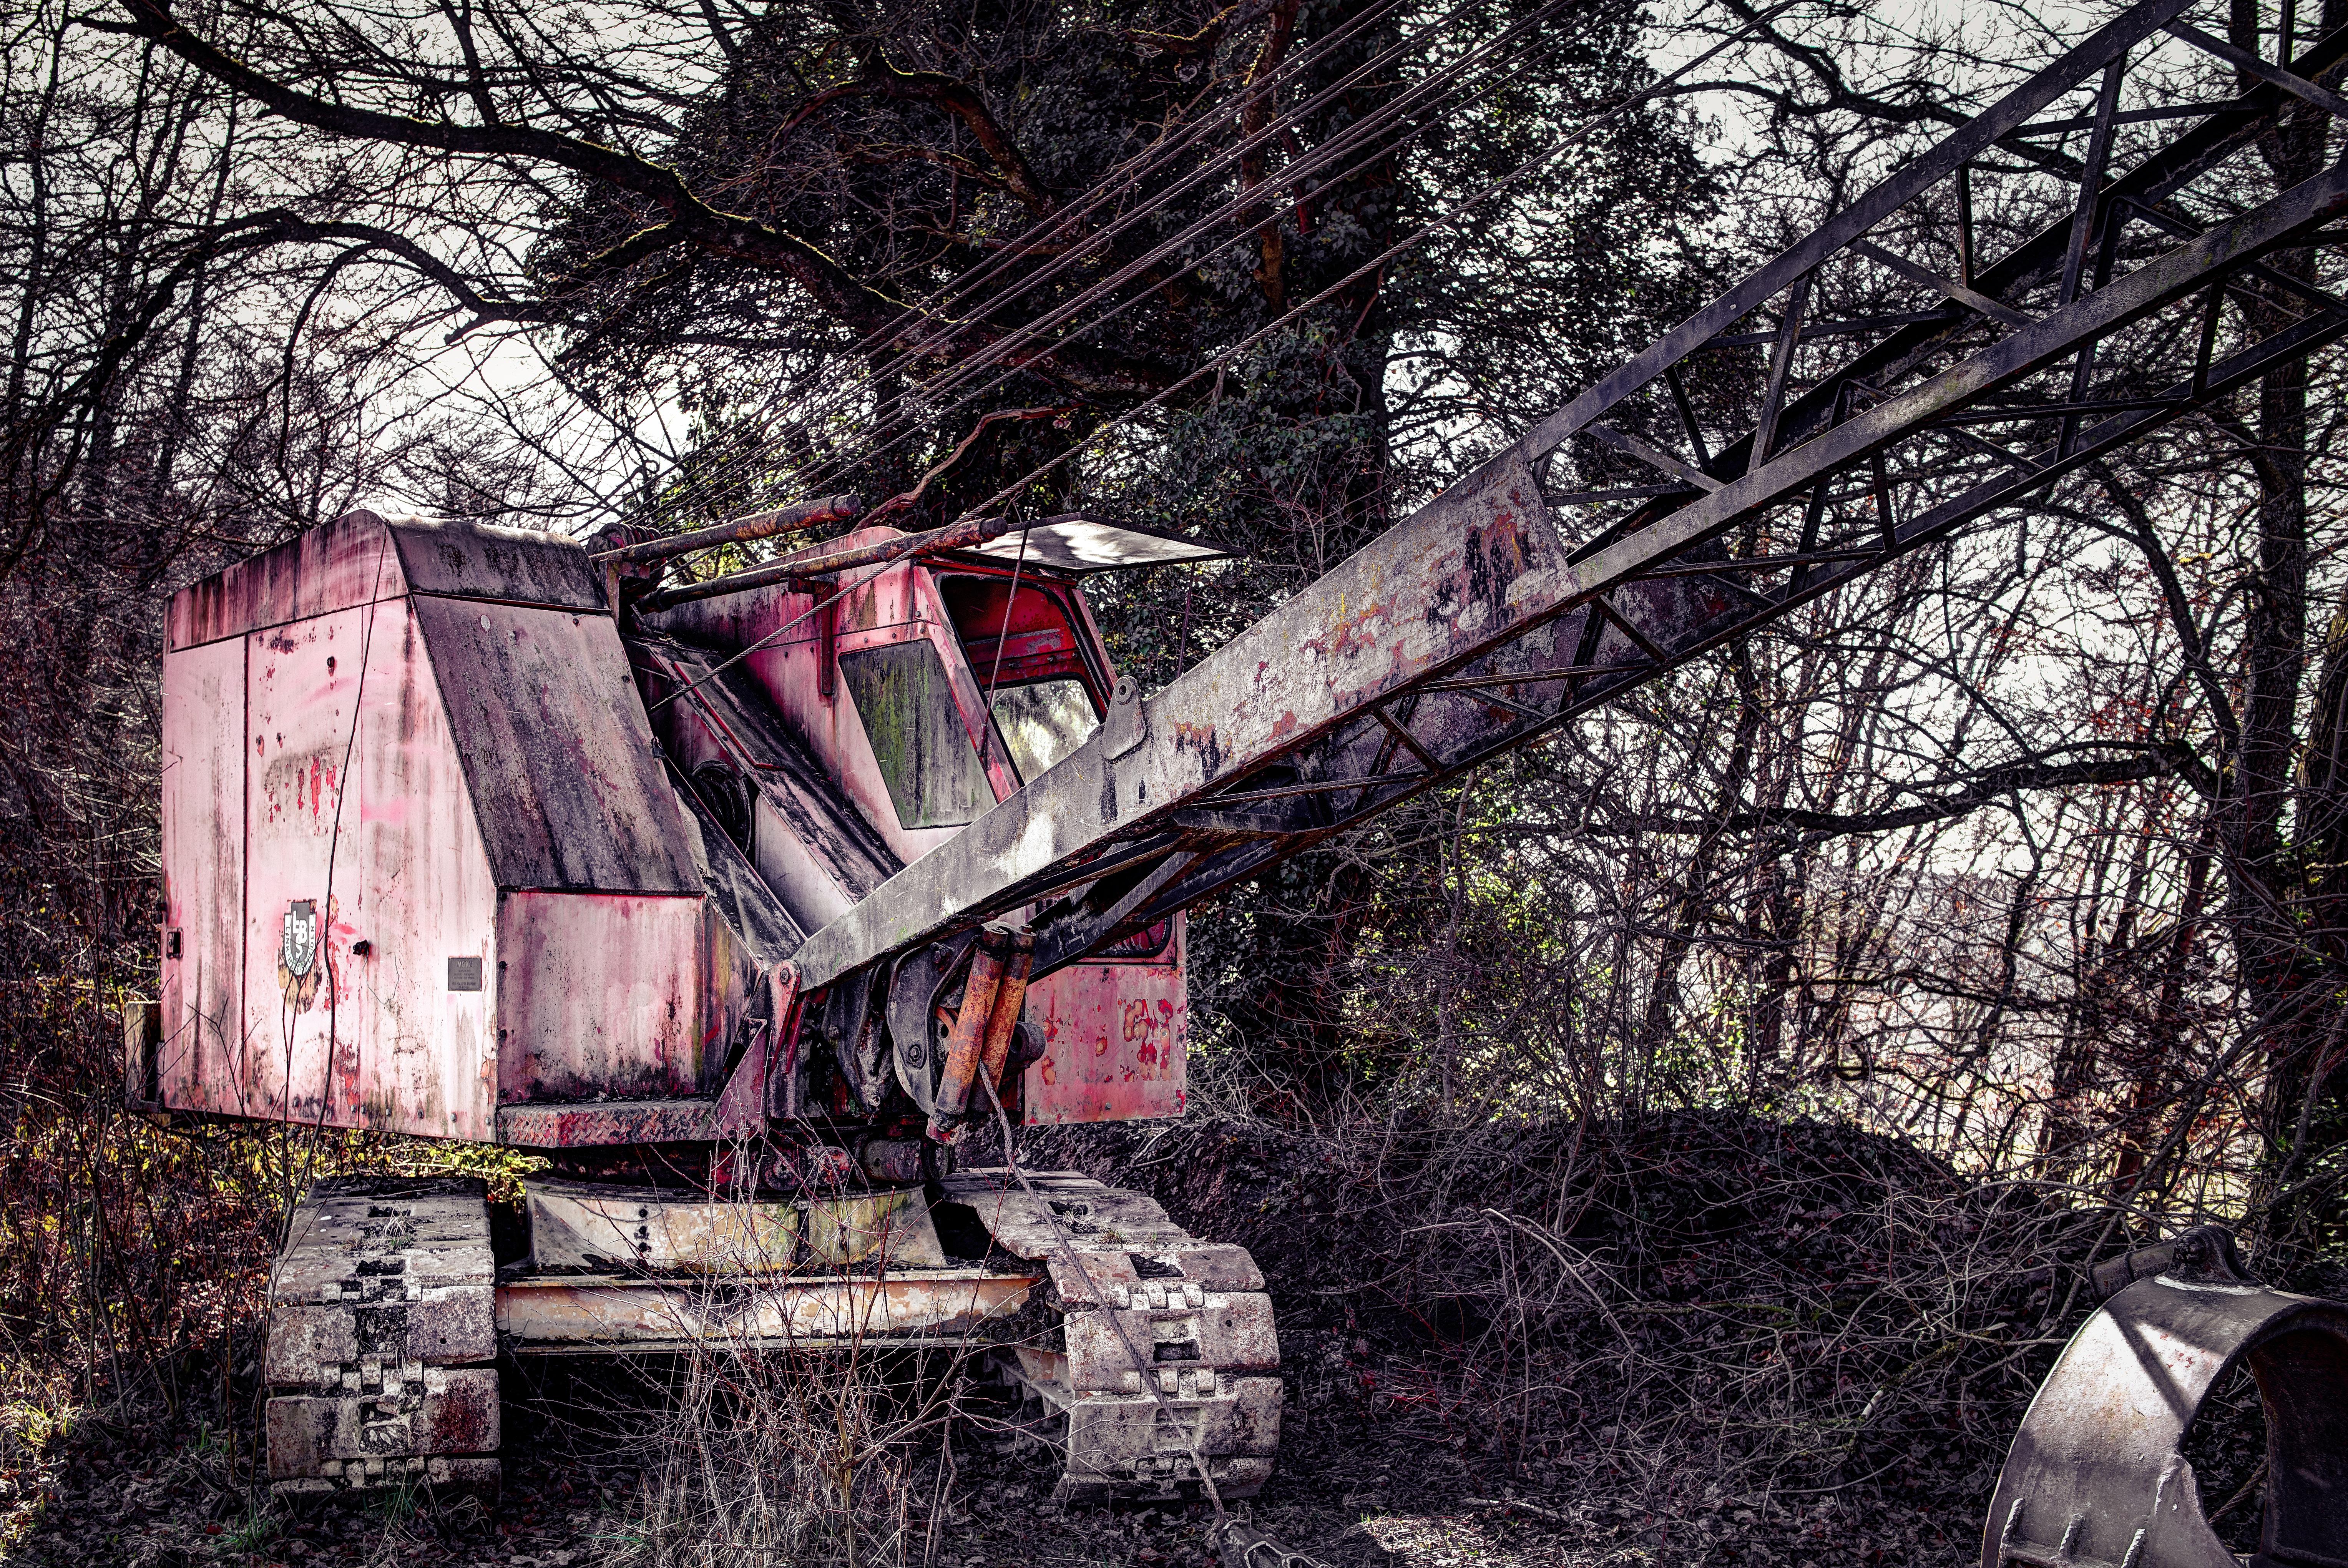 Rust, Construction, Heavy, Machine, Metal, HQ Photo